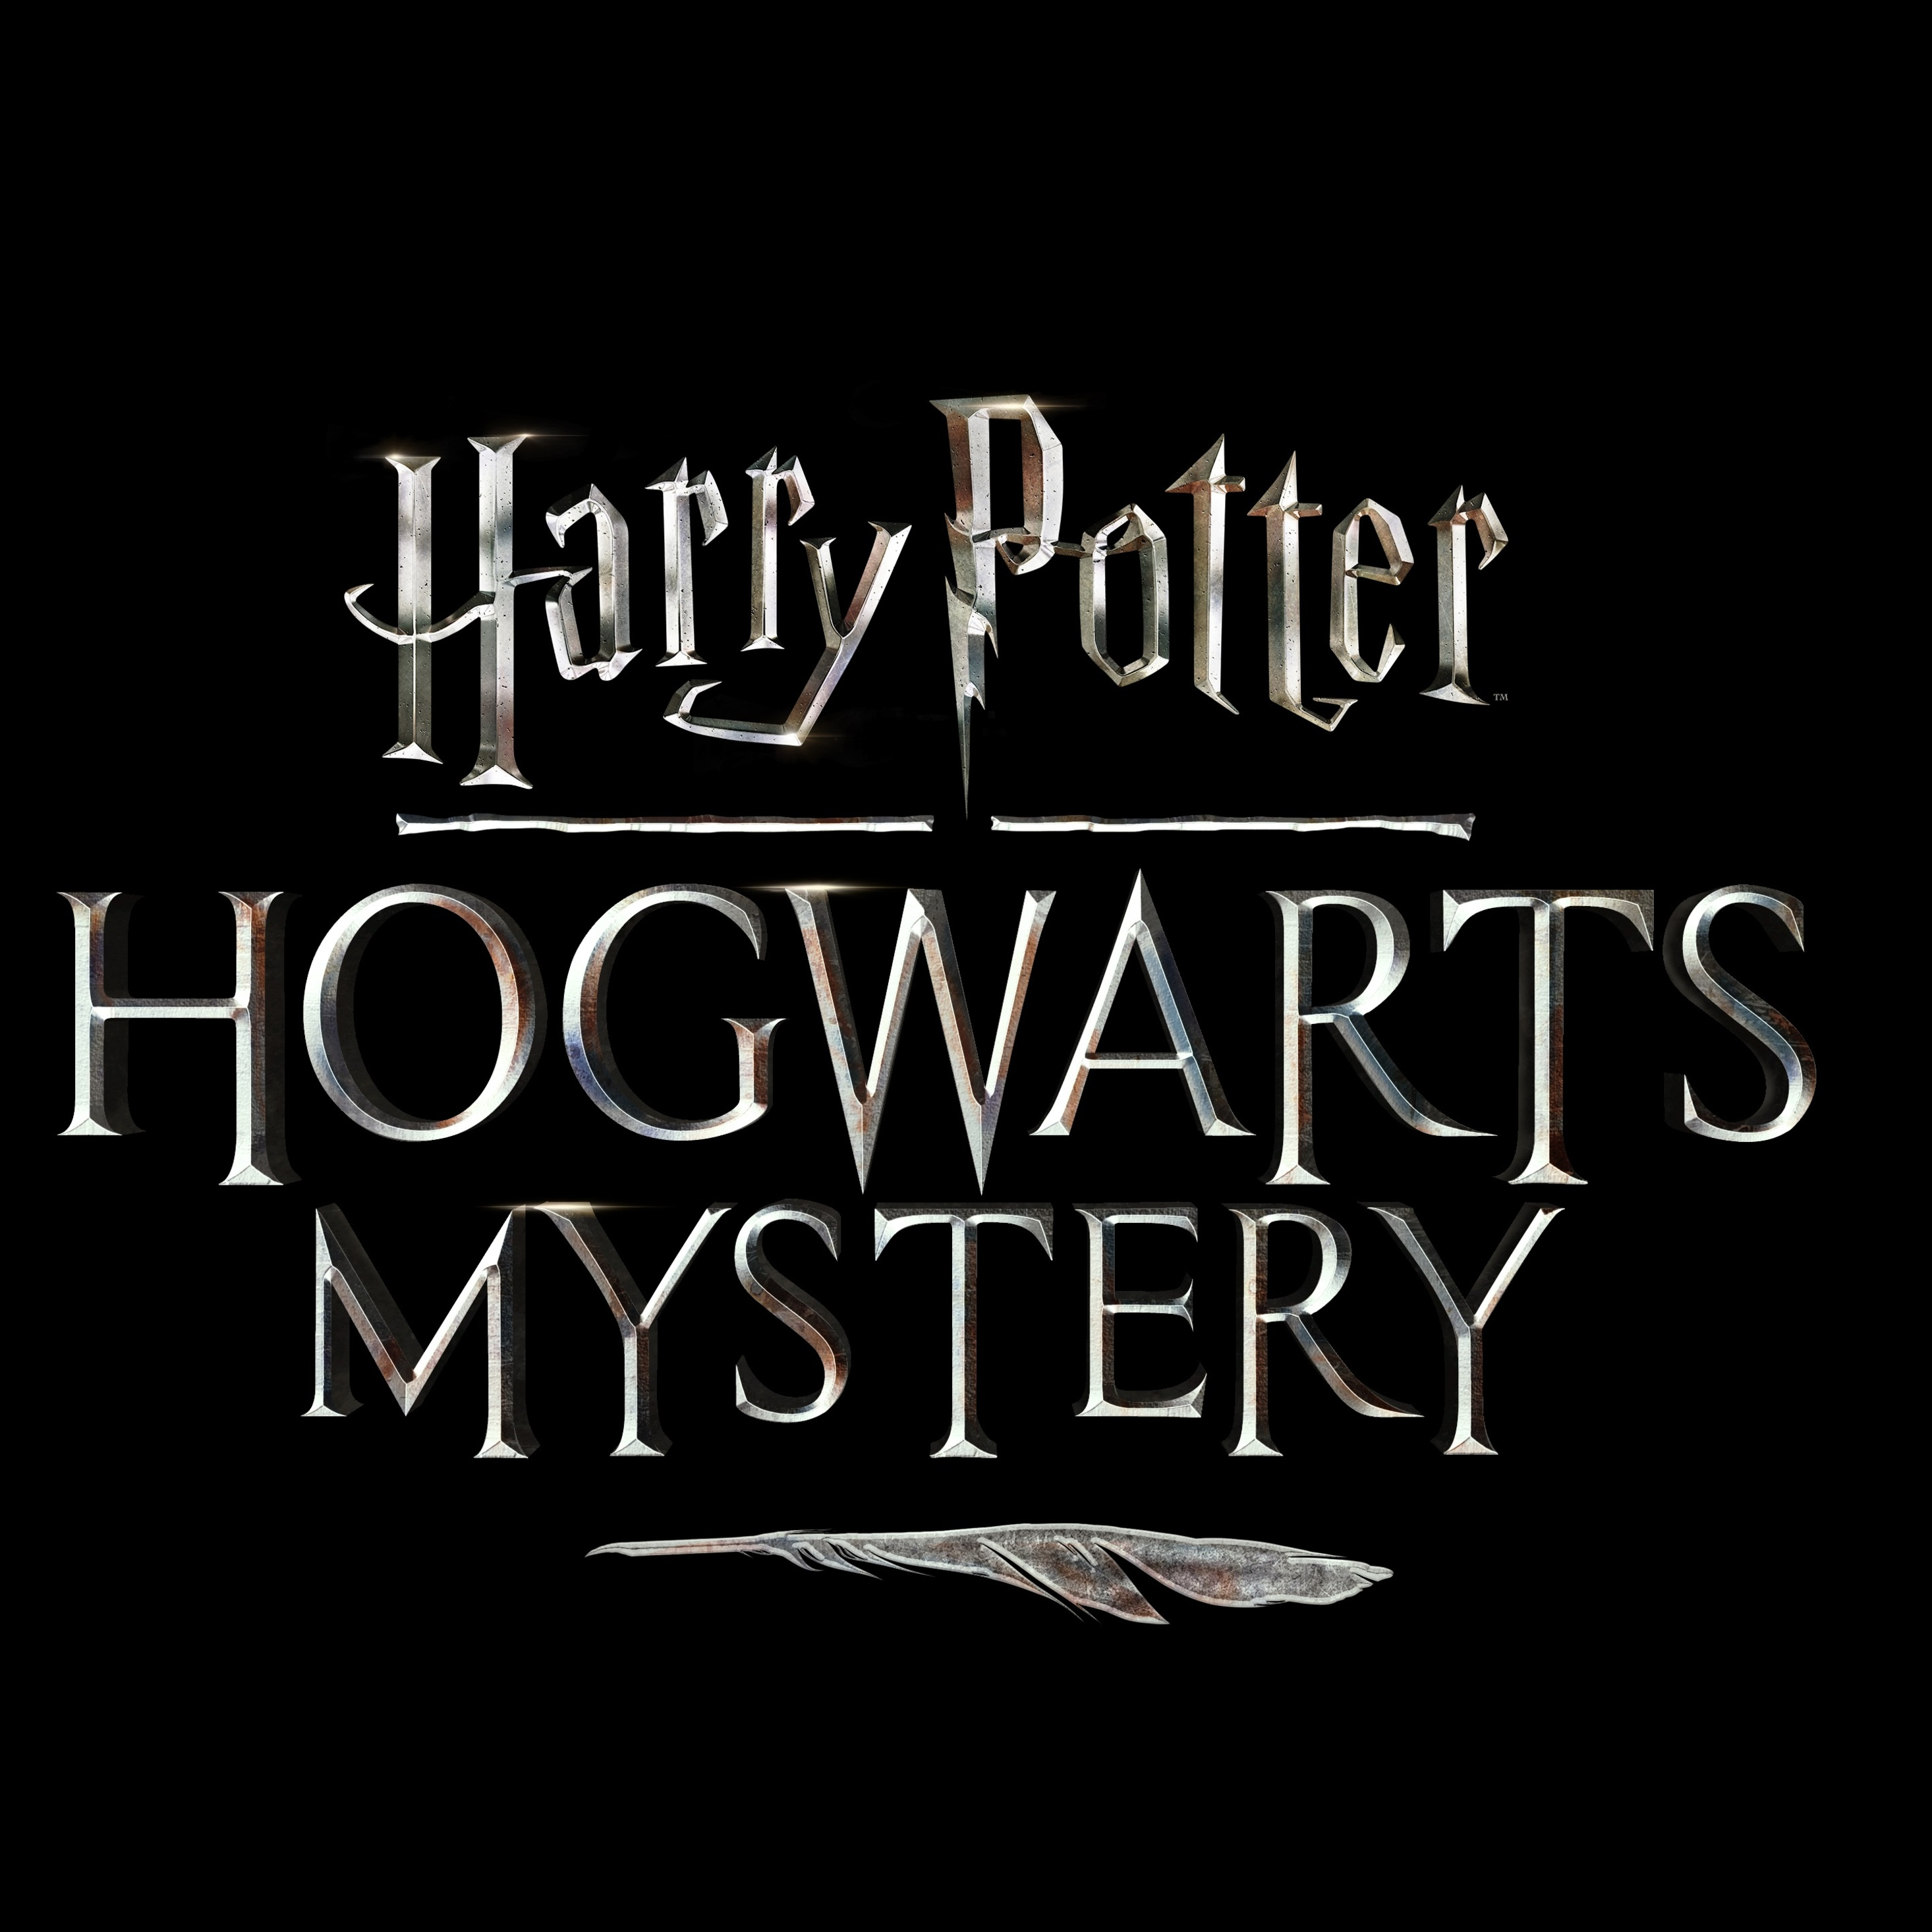 Best Wallpaper Harry Potter Ipad - harry-potter-hogwarts-mystery-game-logo-gc-2932x2932  Gallery_168393.jpg